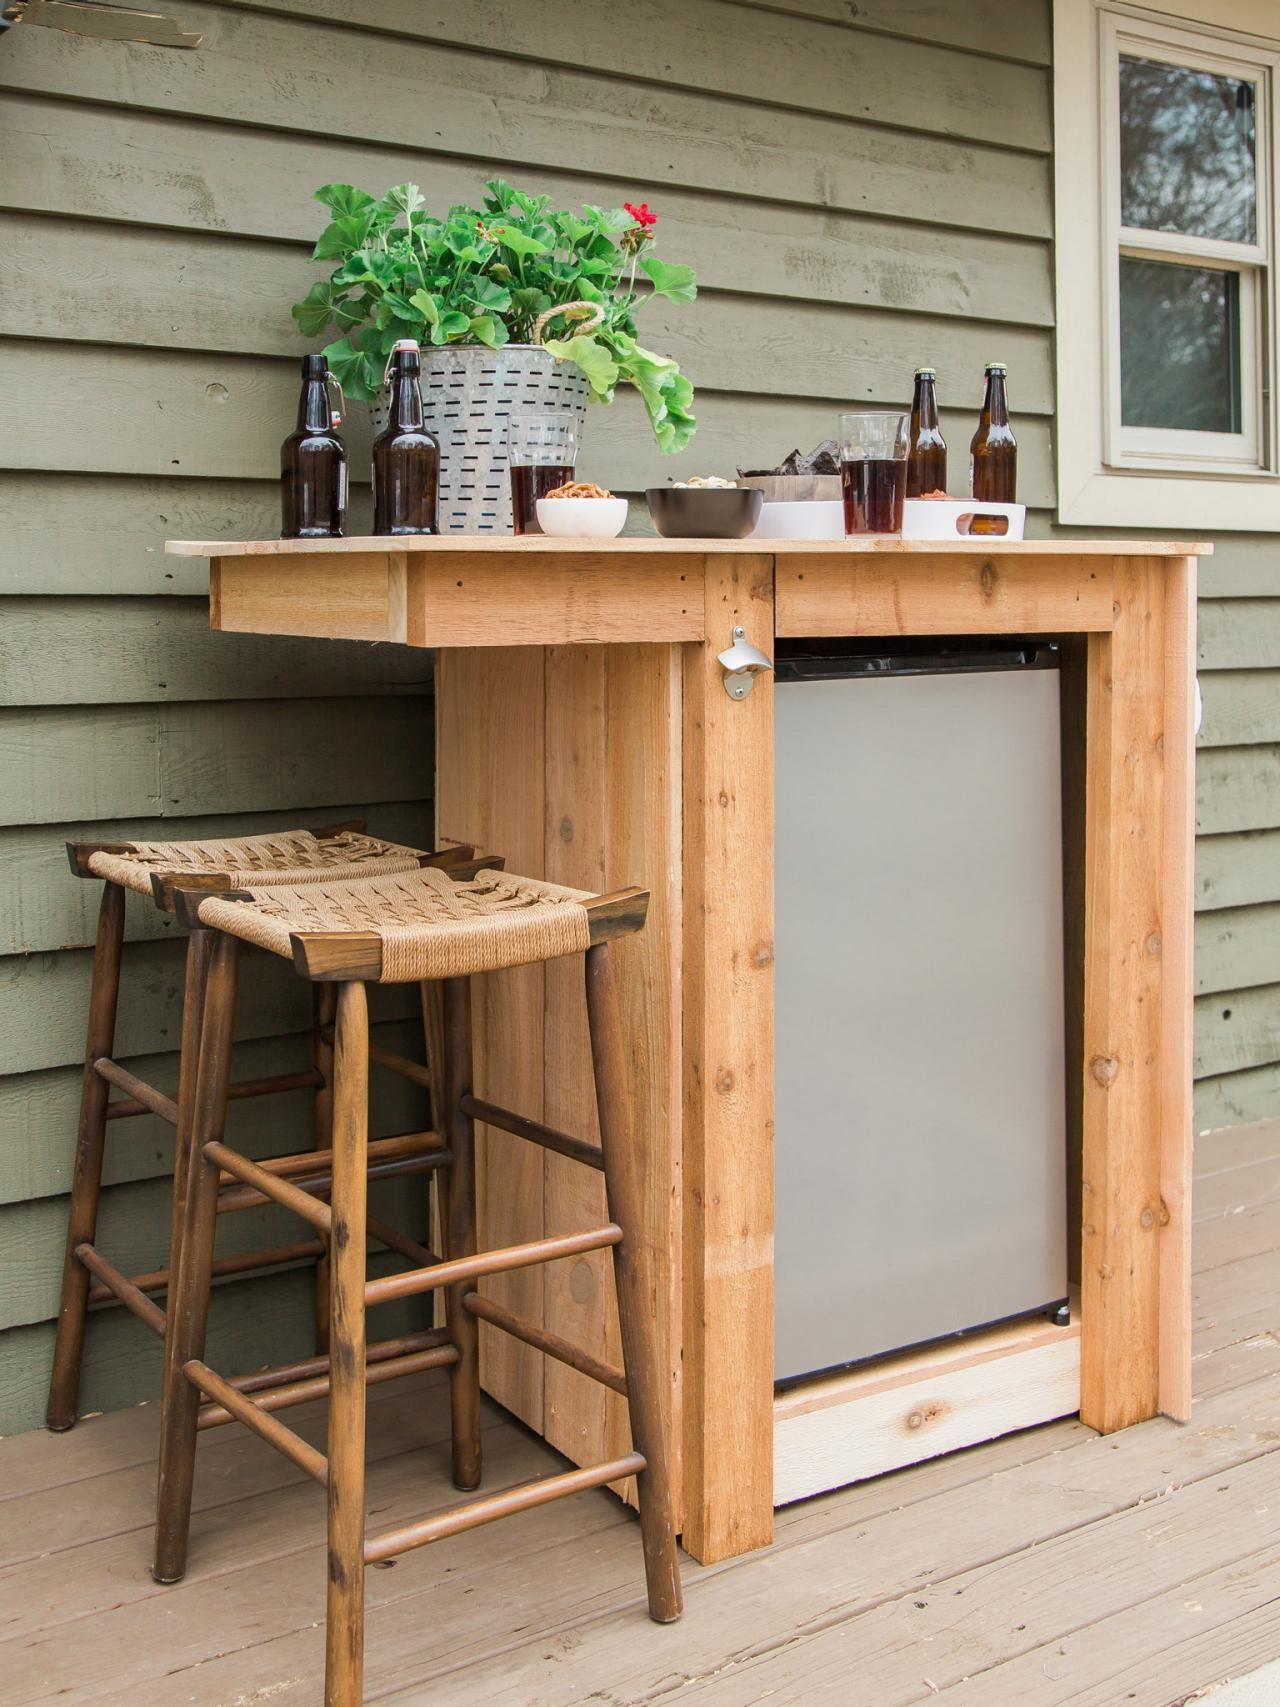 Waterproof Box For Outdoor Fridge Google Search Diy Outdoor